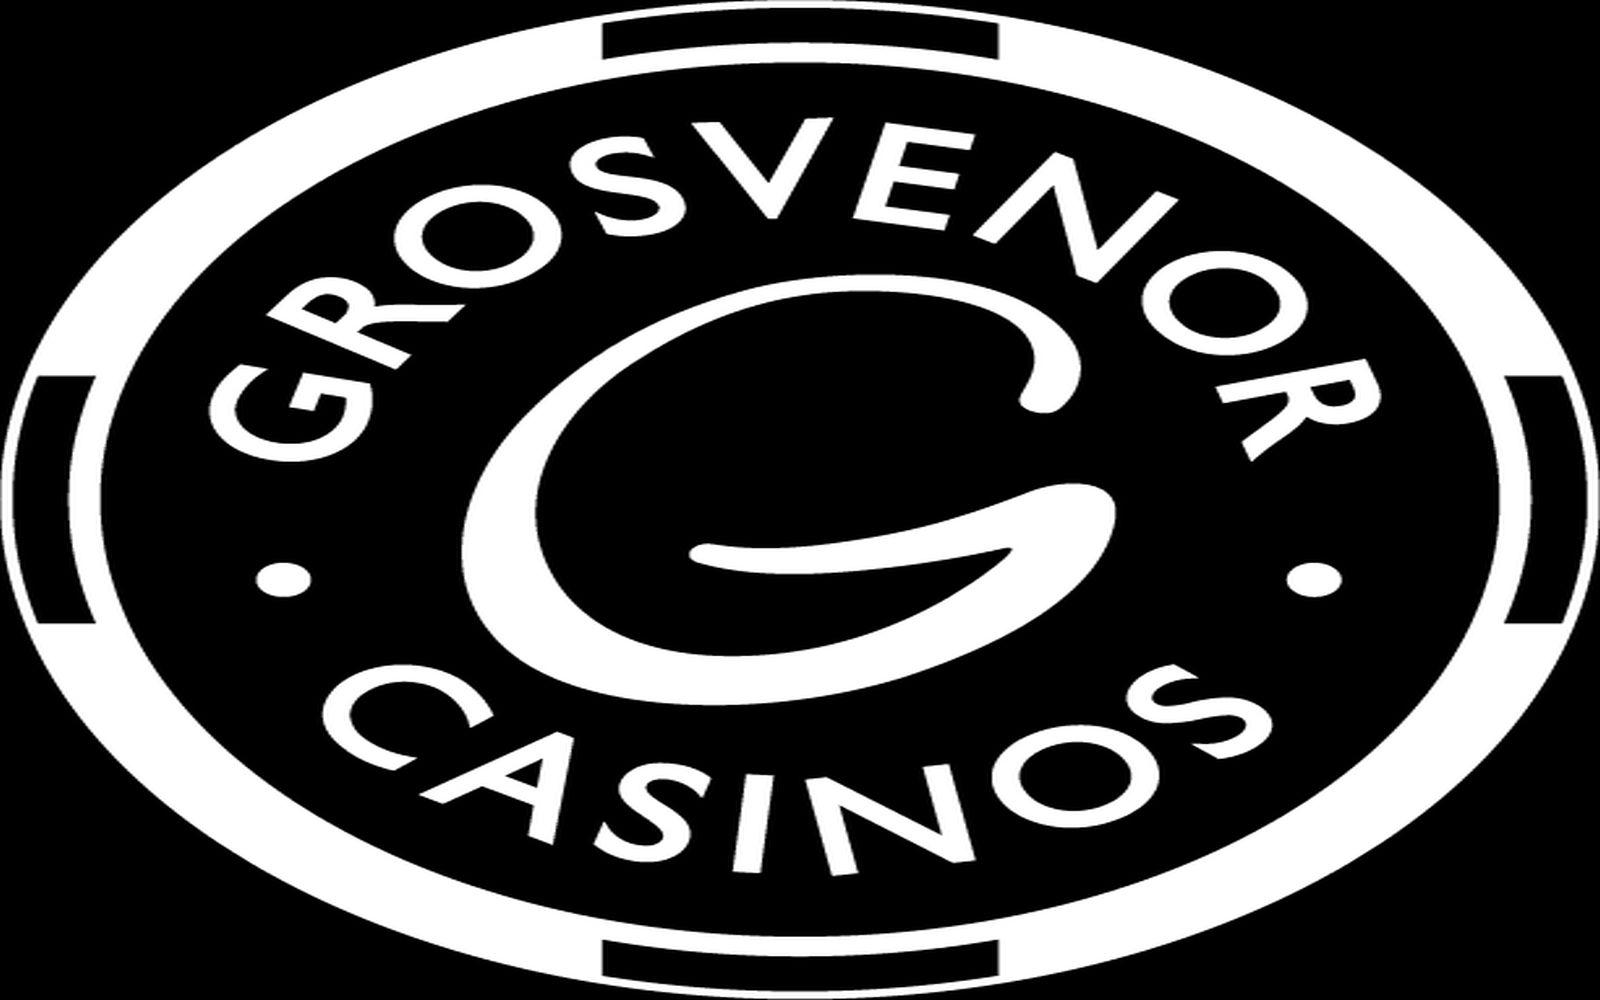 Grosvenor Bolton